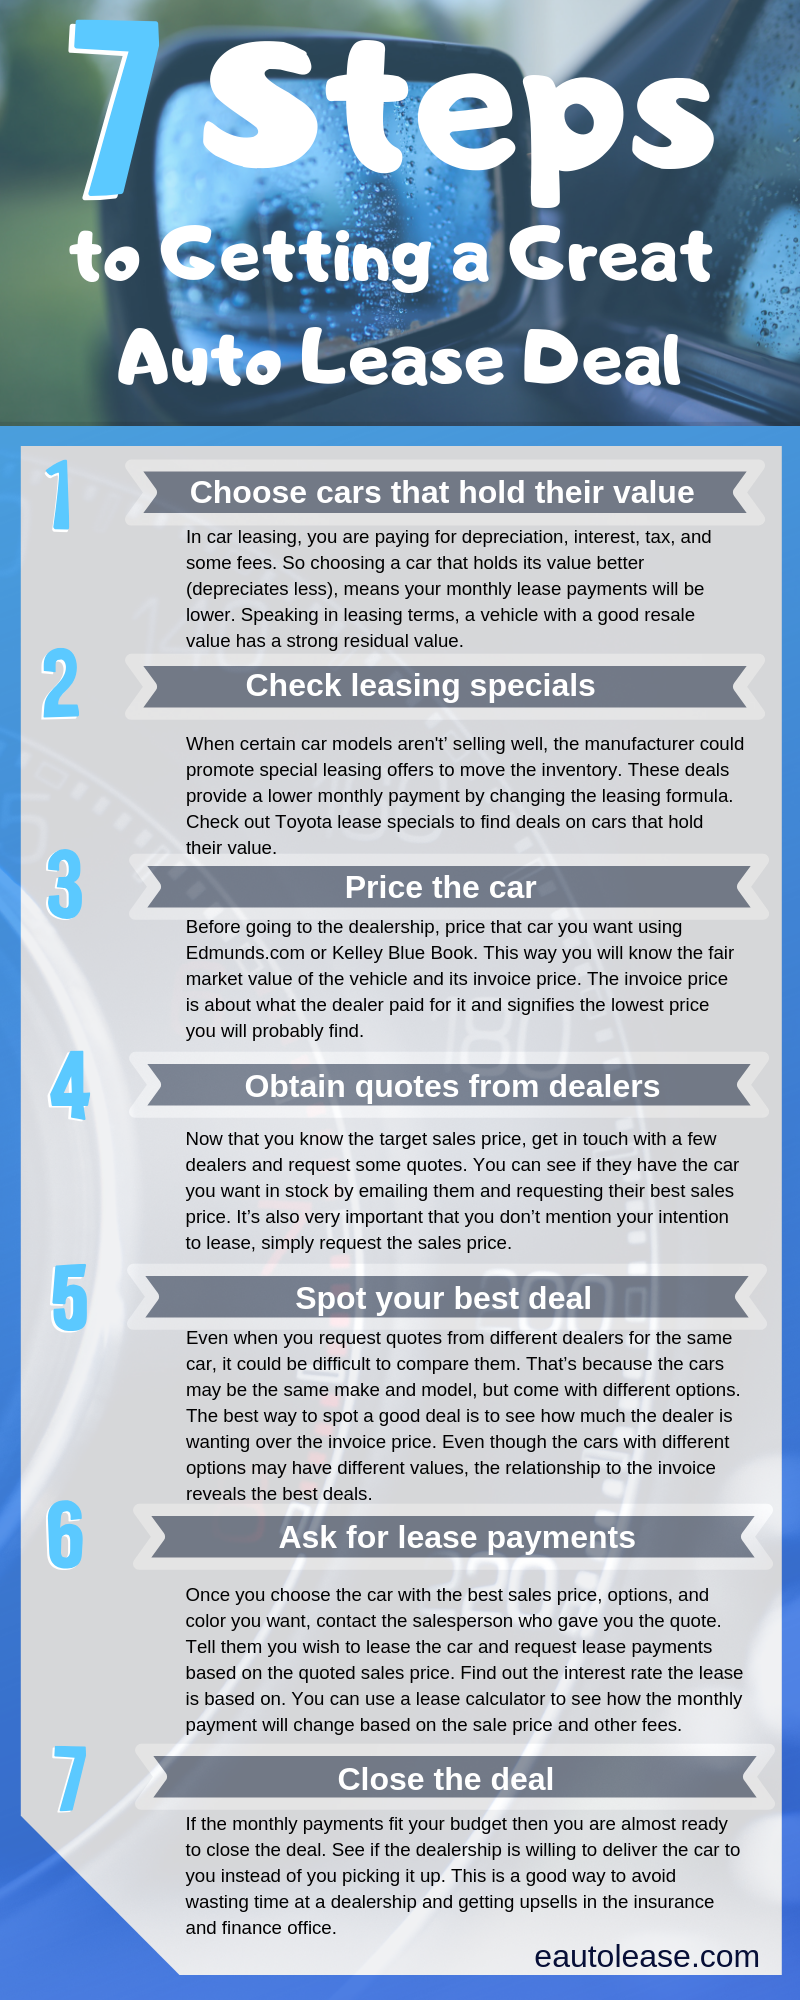 Fair Market Value Car Calculator >> Eautolease 3820 Nostrand Ave 107 Brooklyn Ny 11235 1